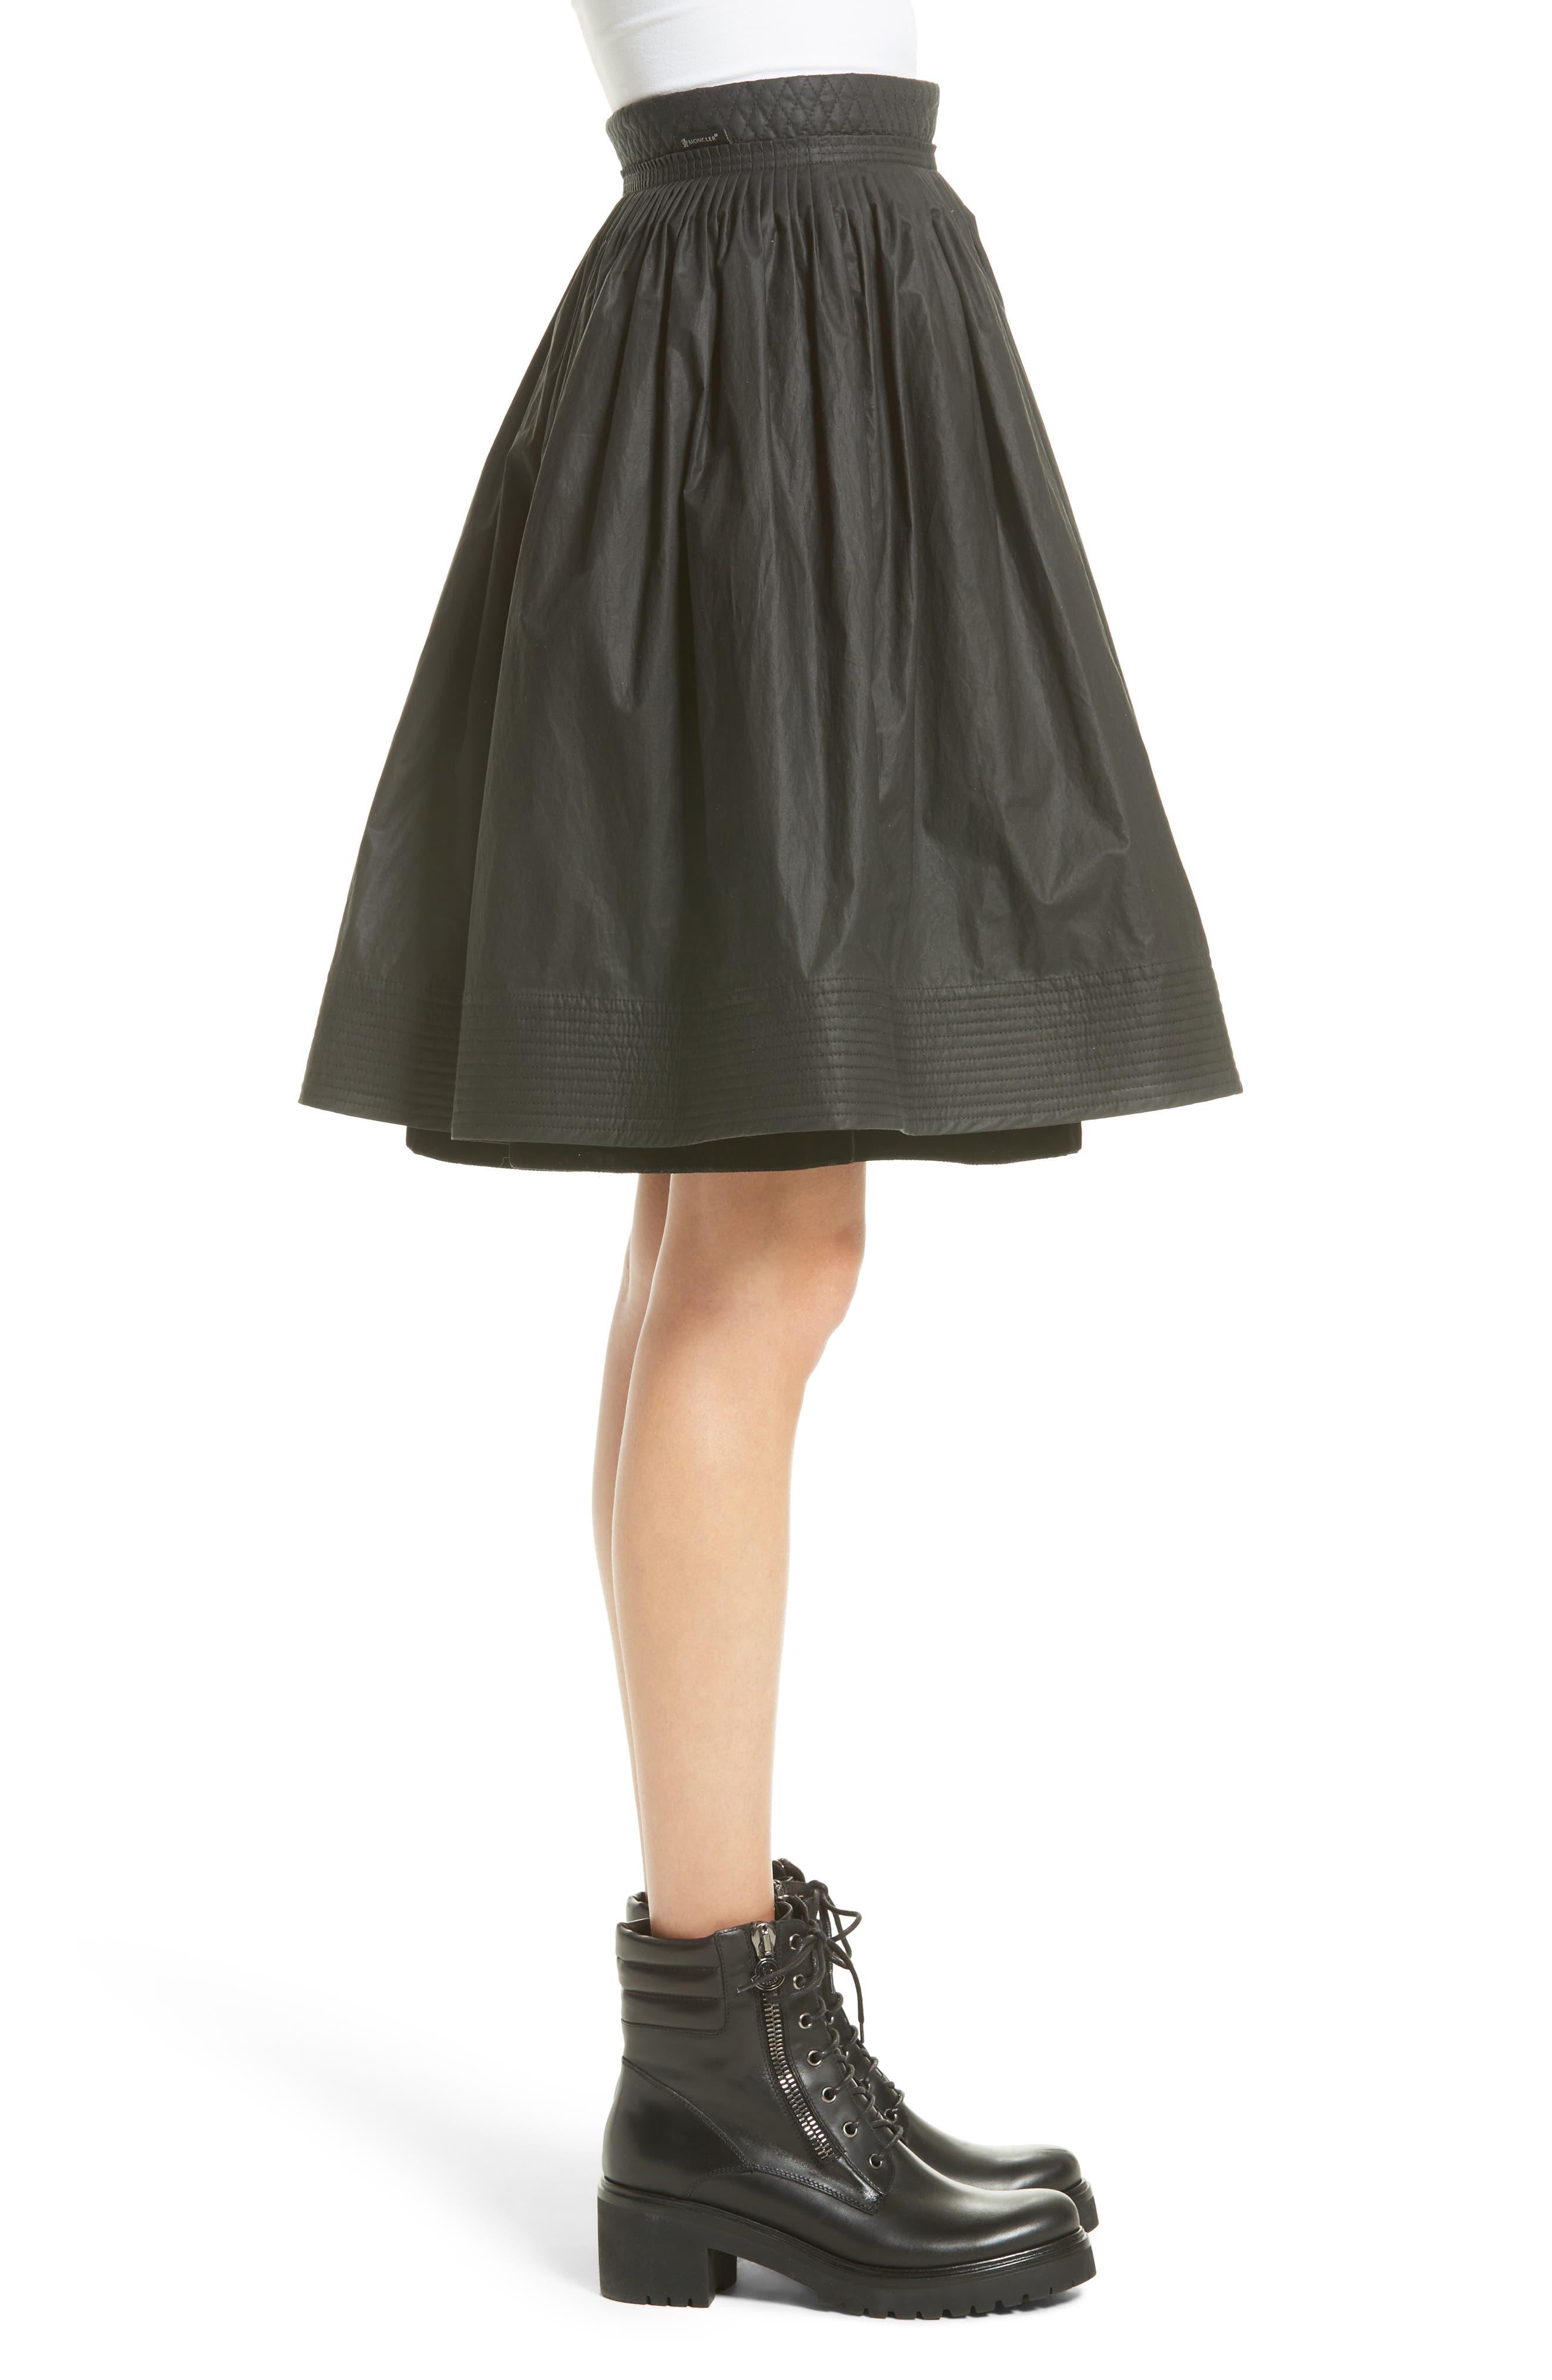 Gonna Cotton A-Line Skirt,                             Alternate thumbnail 3, color,